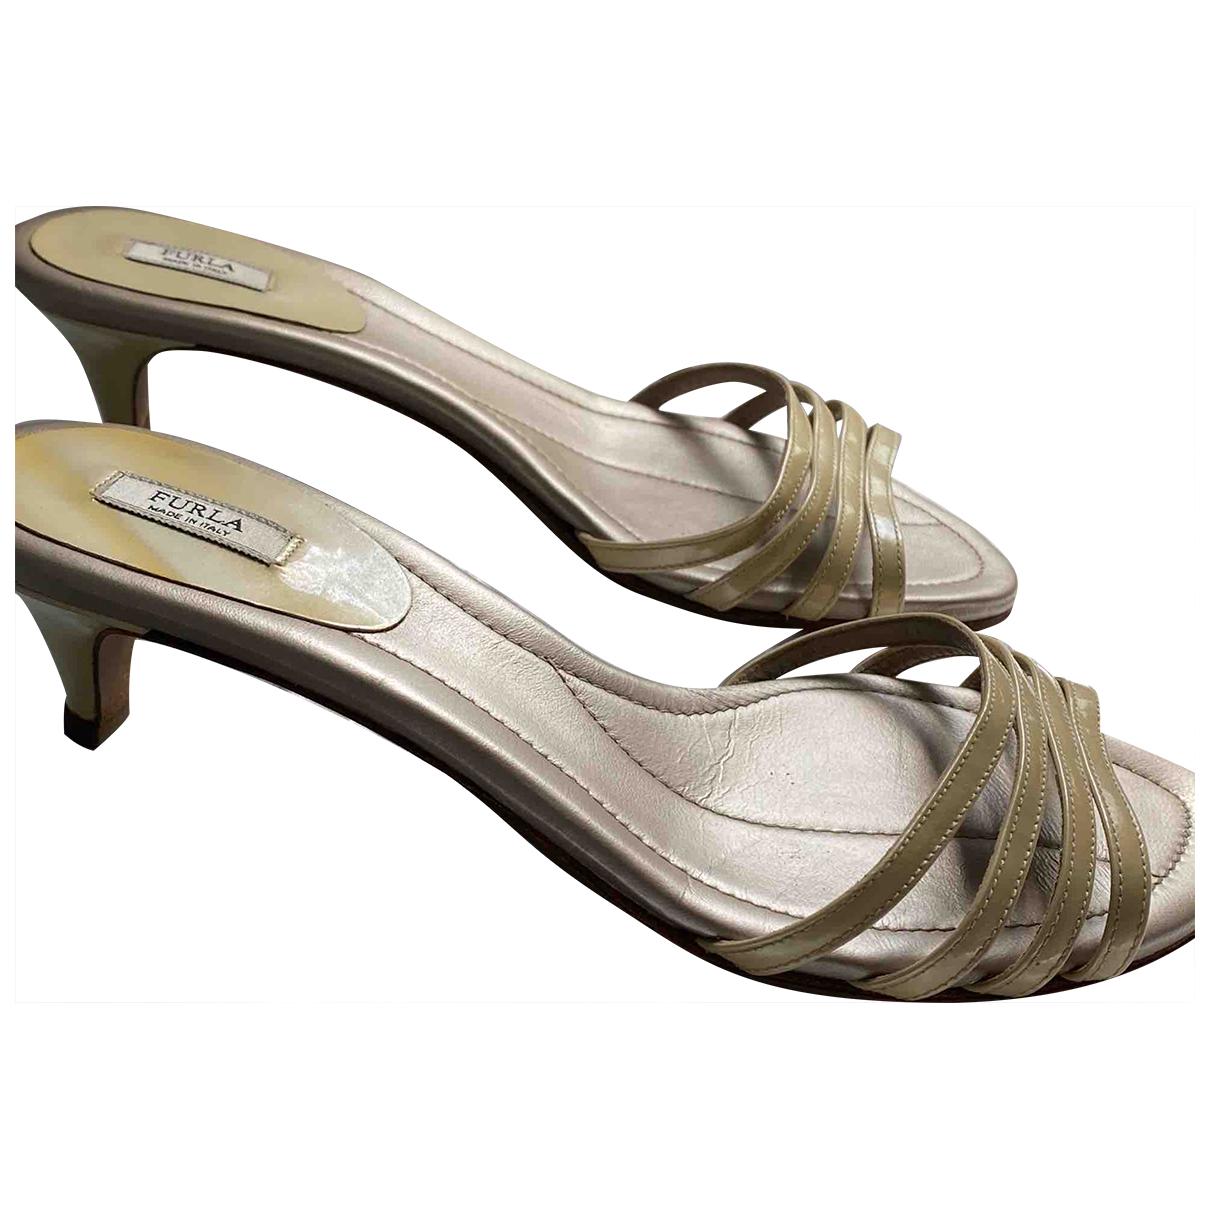 Furla \N Beige Leather Sandals for Women 38 EU